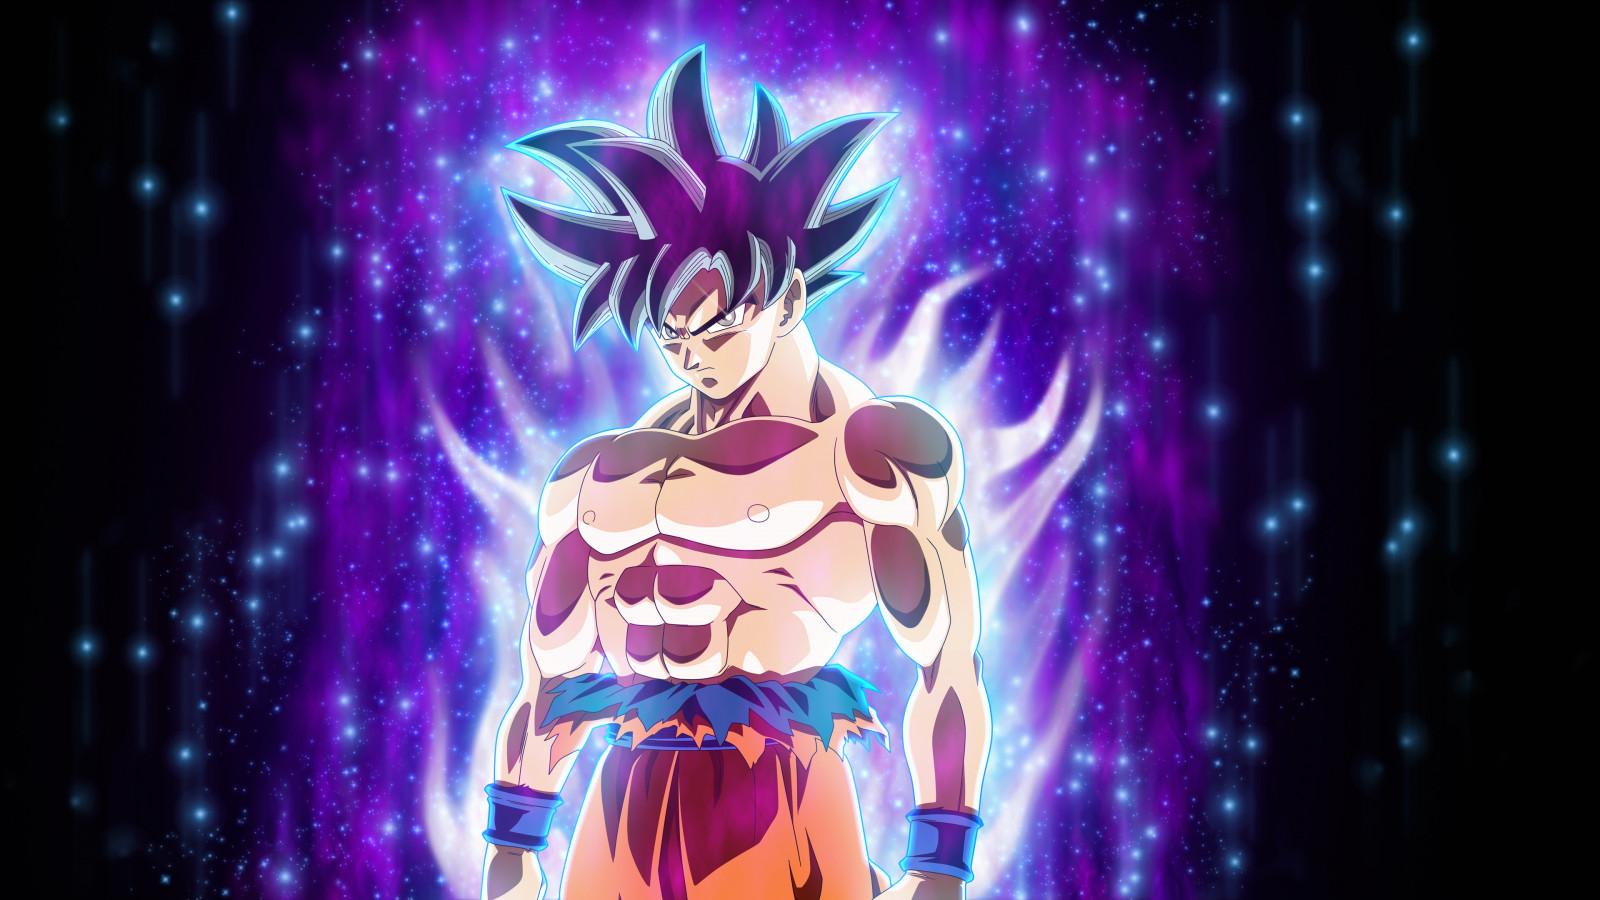 Wallpaper Dragon Ball Super Son Goku Ultra Instinct 3840x2160